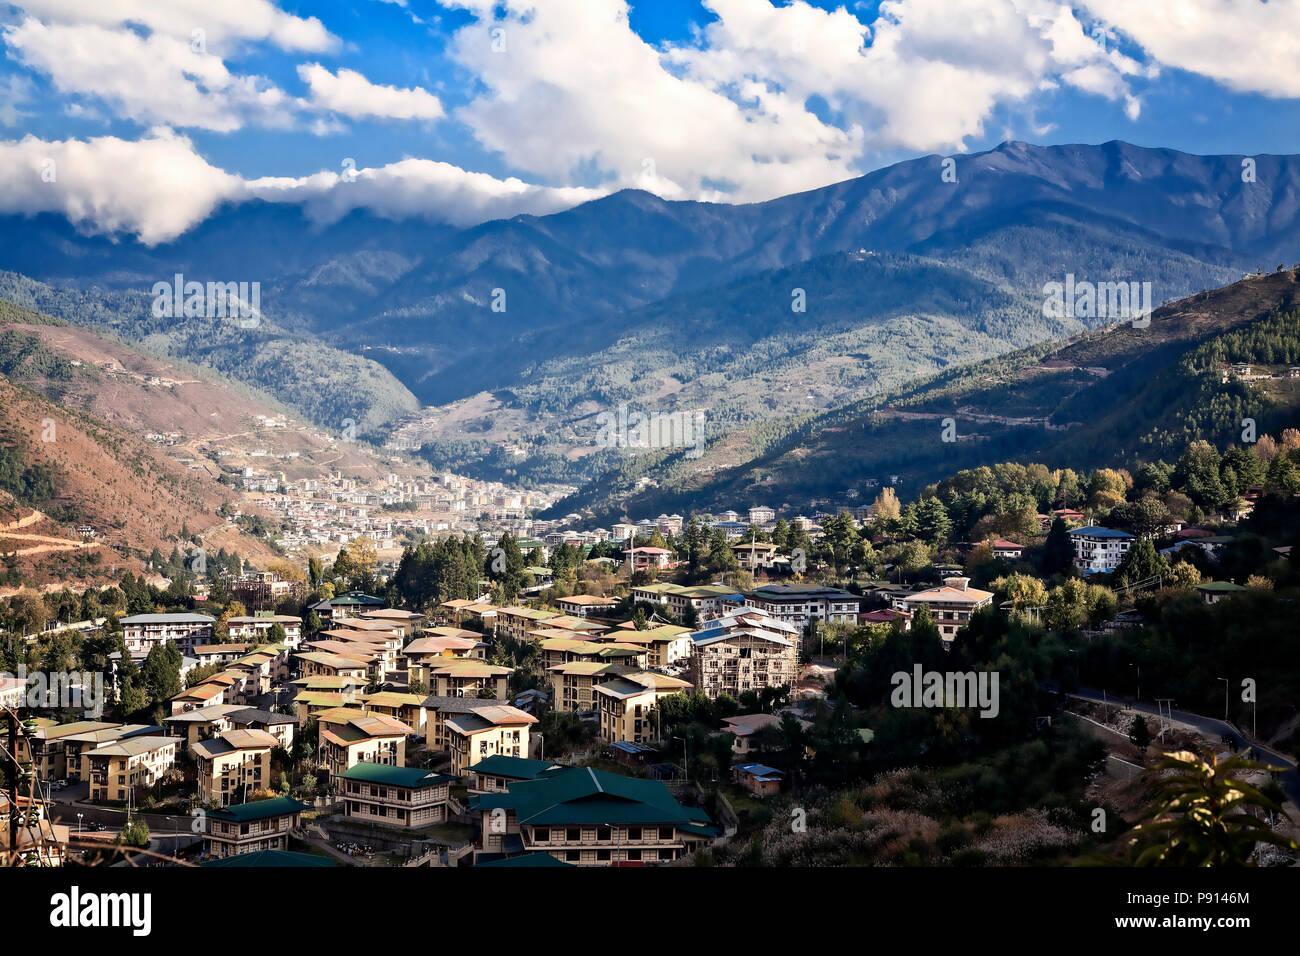 La città capitale di Thimphu nei foothills dell'Himalaya, Bhutan. Immagini Stock